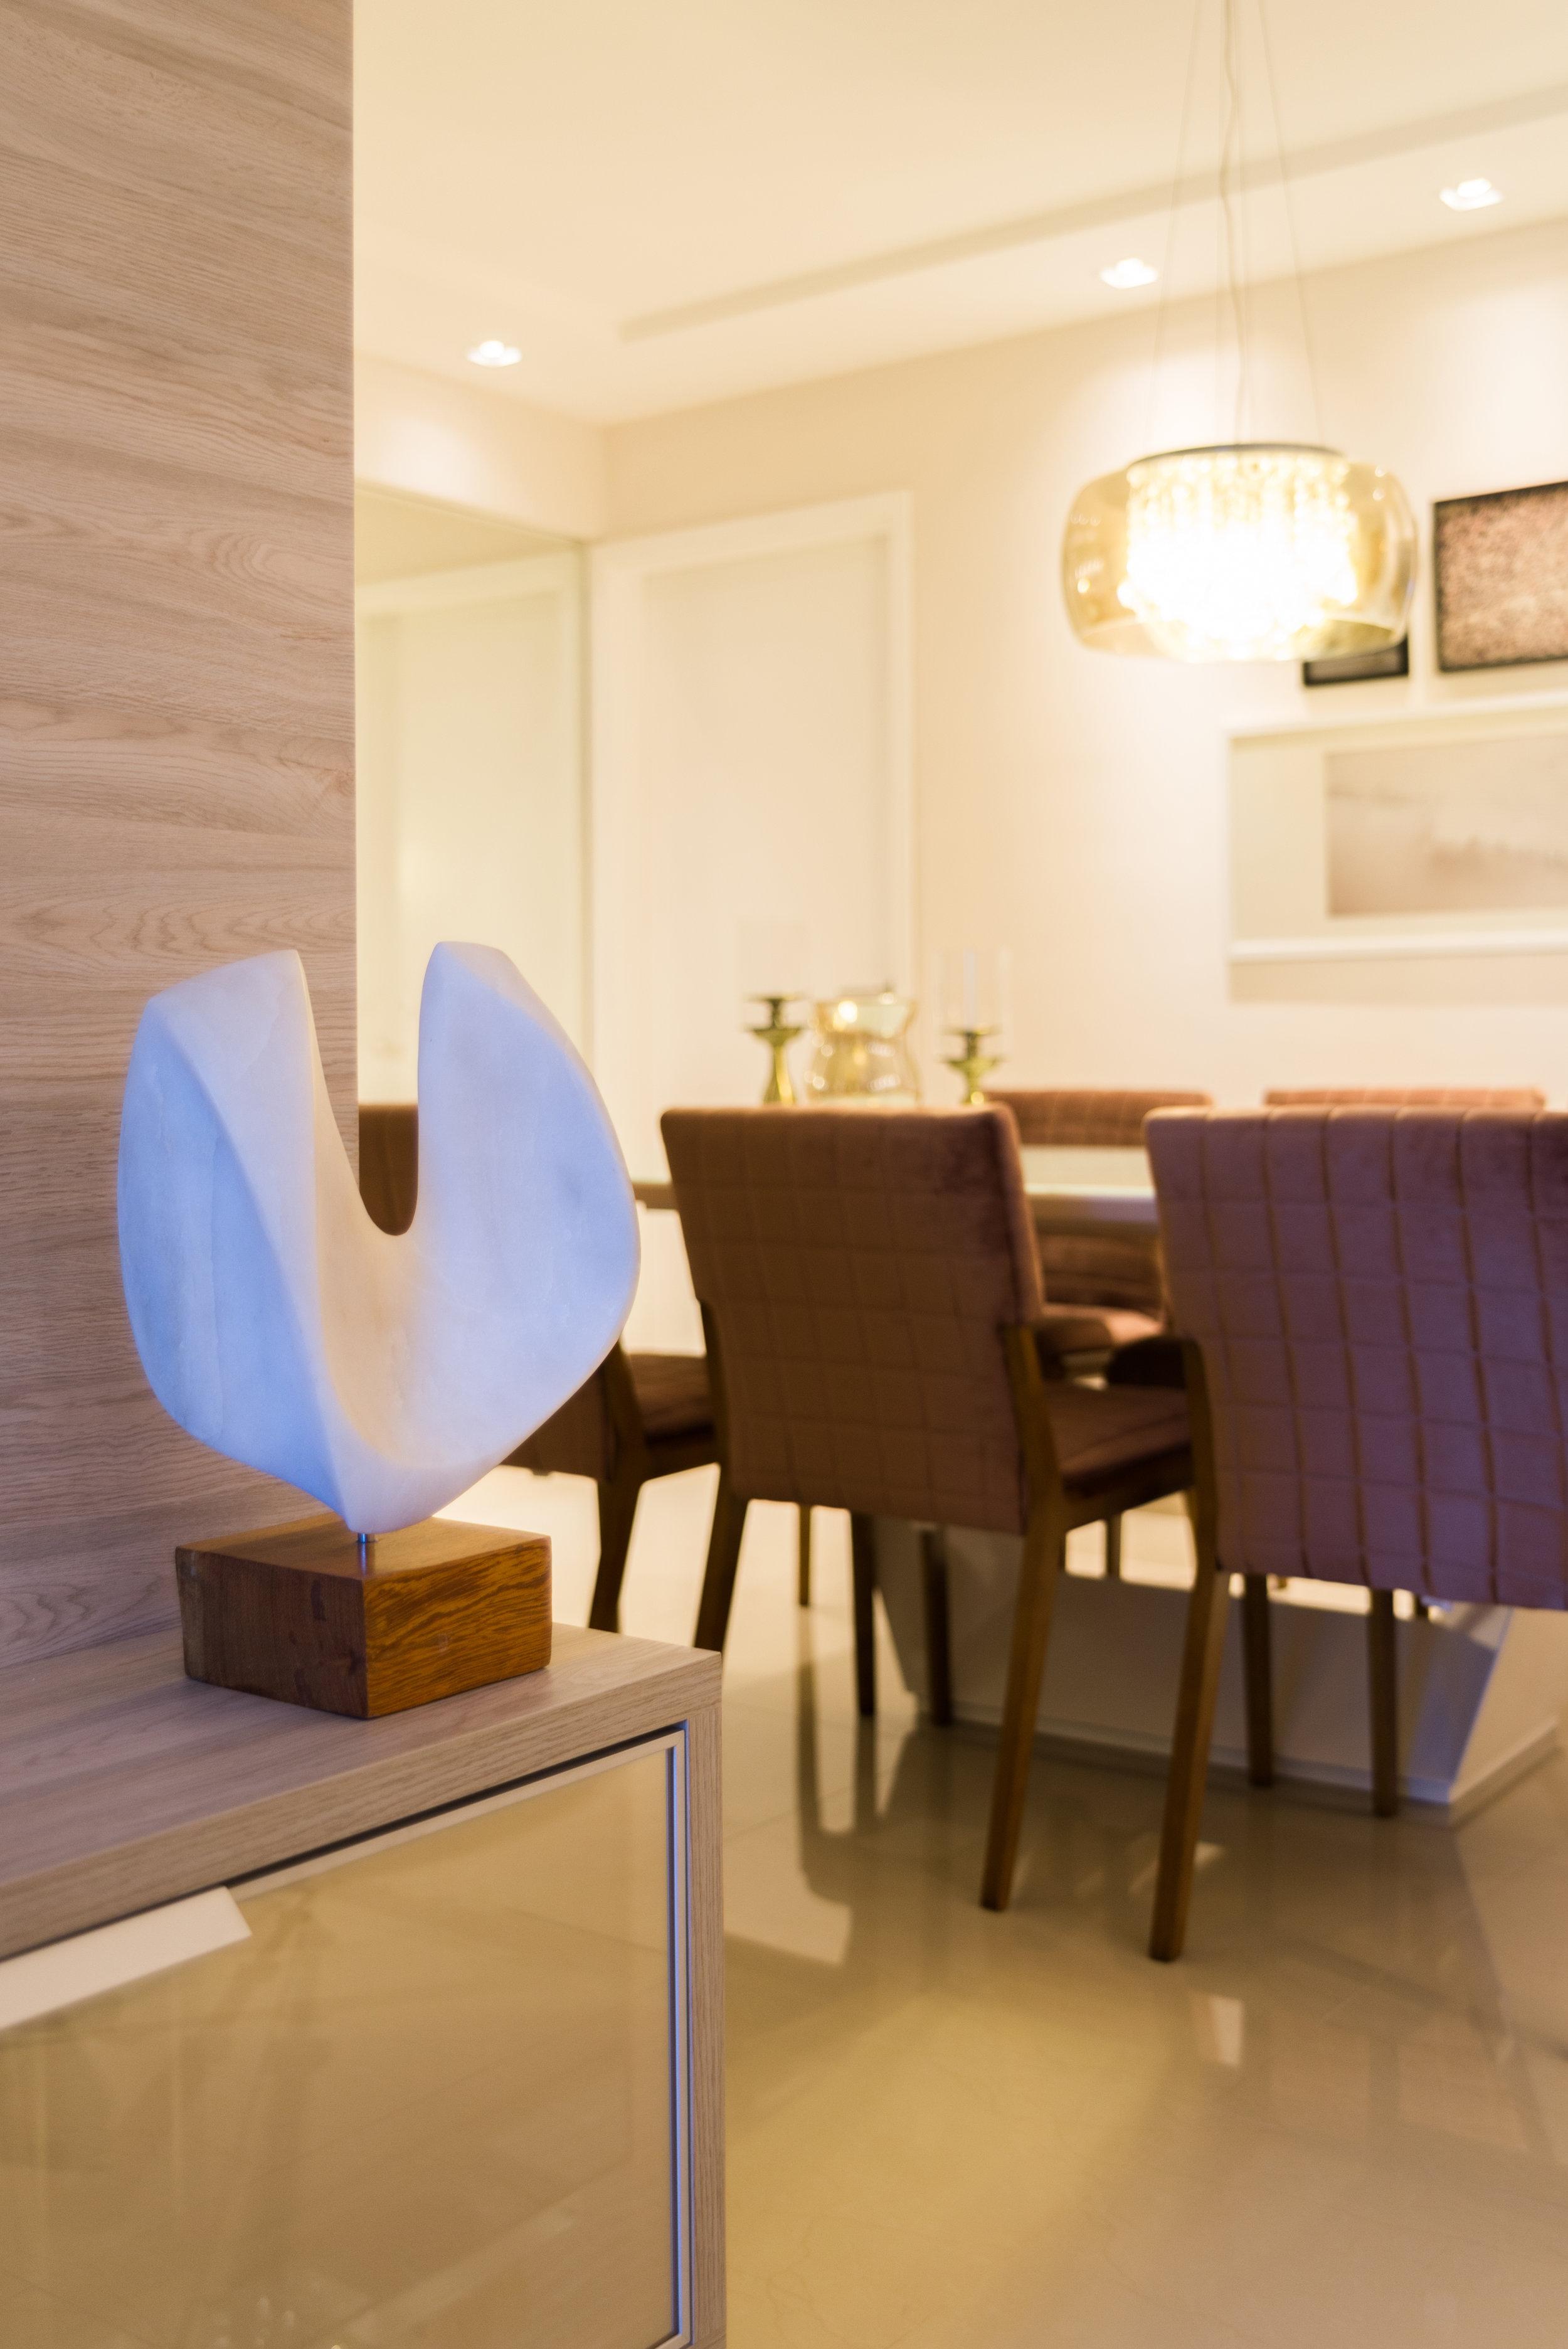 projeto-arquitetonico-rafaeldebora-duo-arquitetura-apartamentos-026.jpg